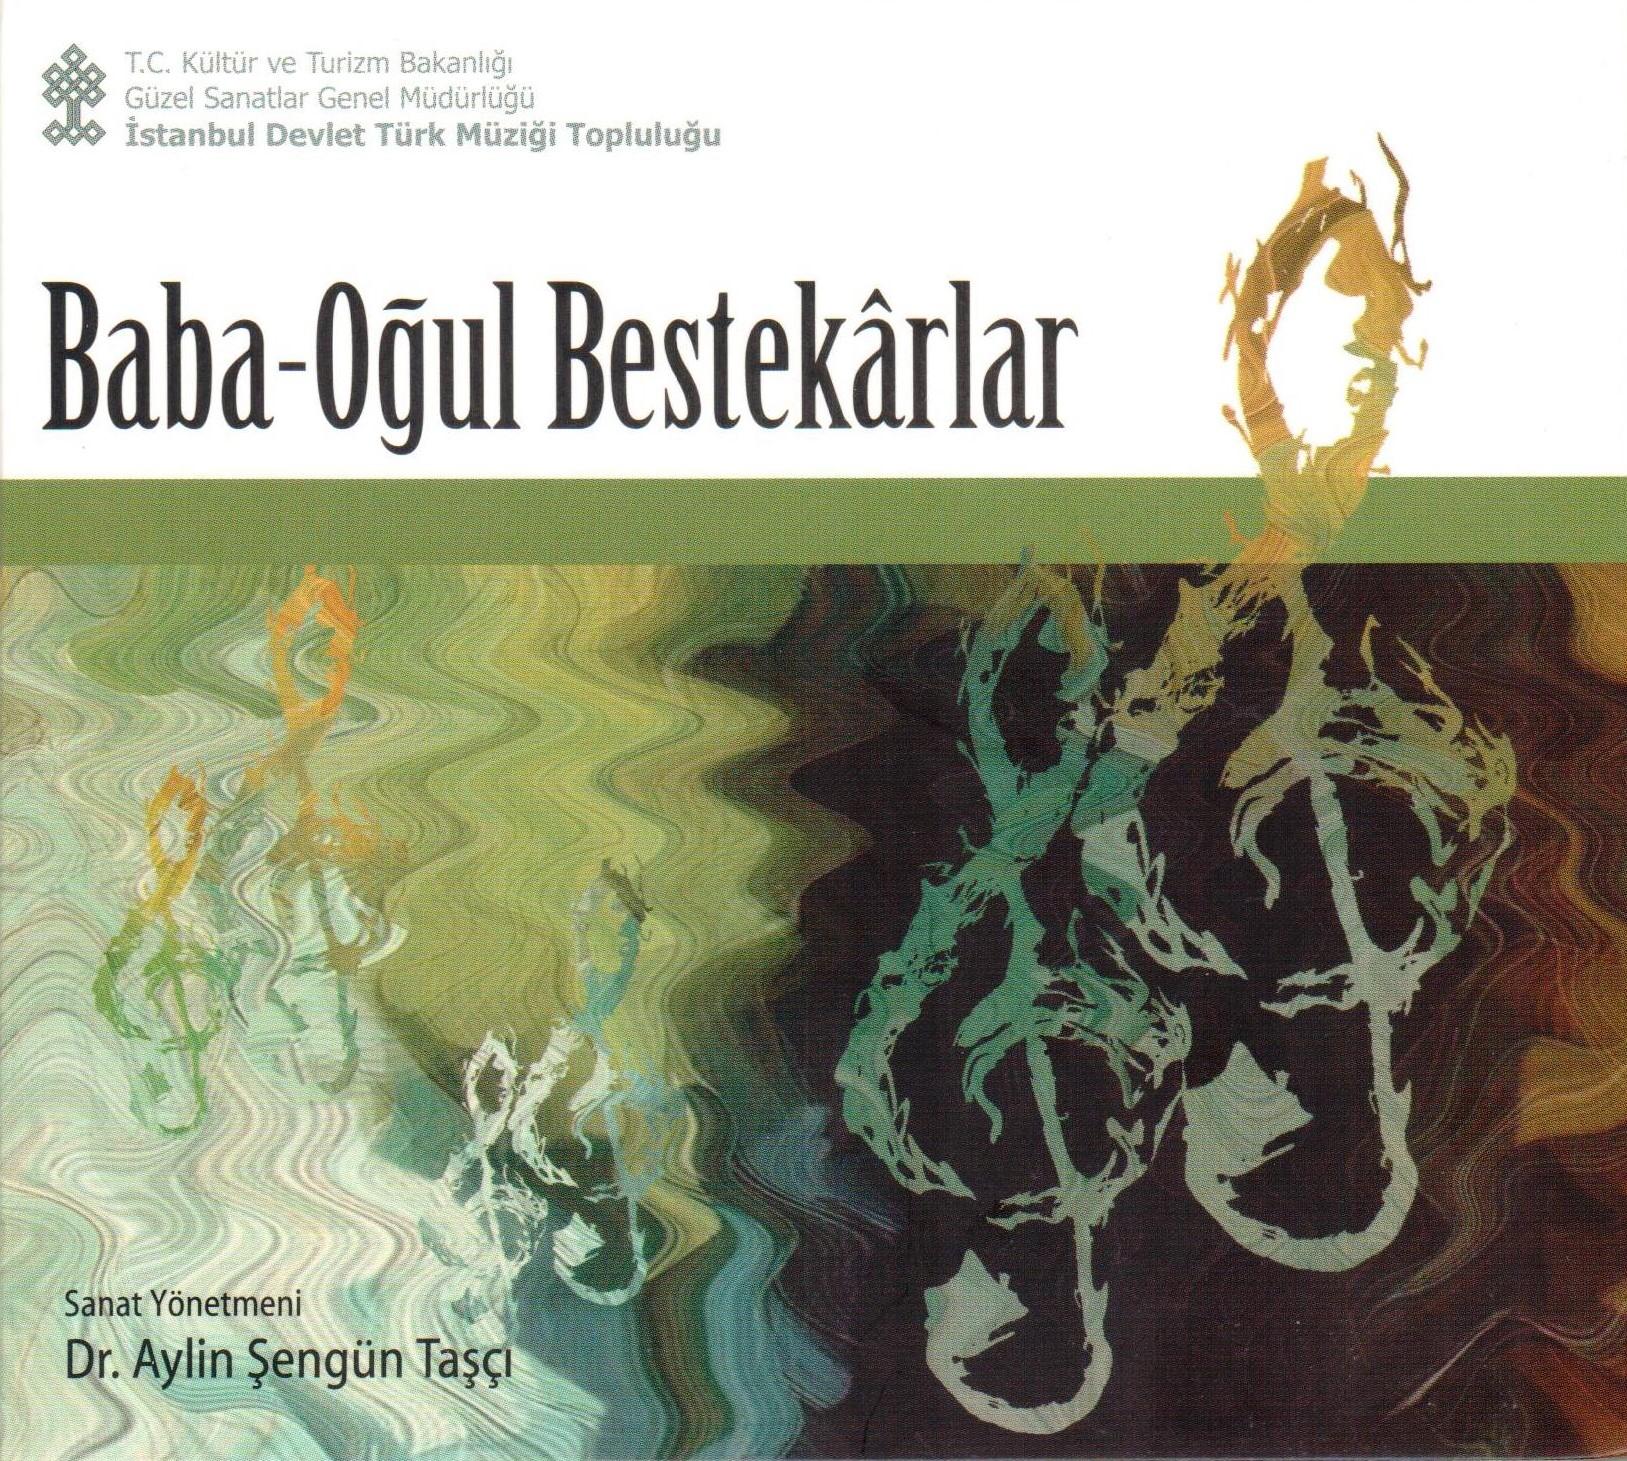 Ud Taksimi - Hüzzam Yürük Semâi